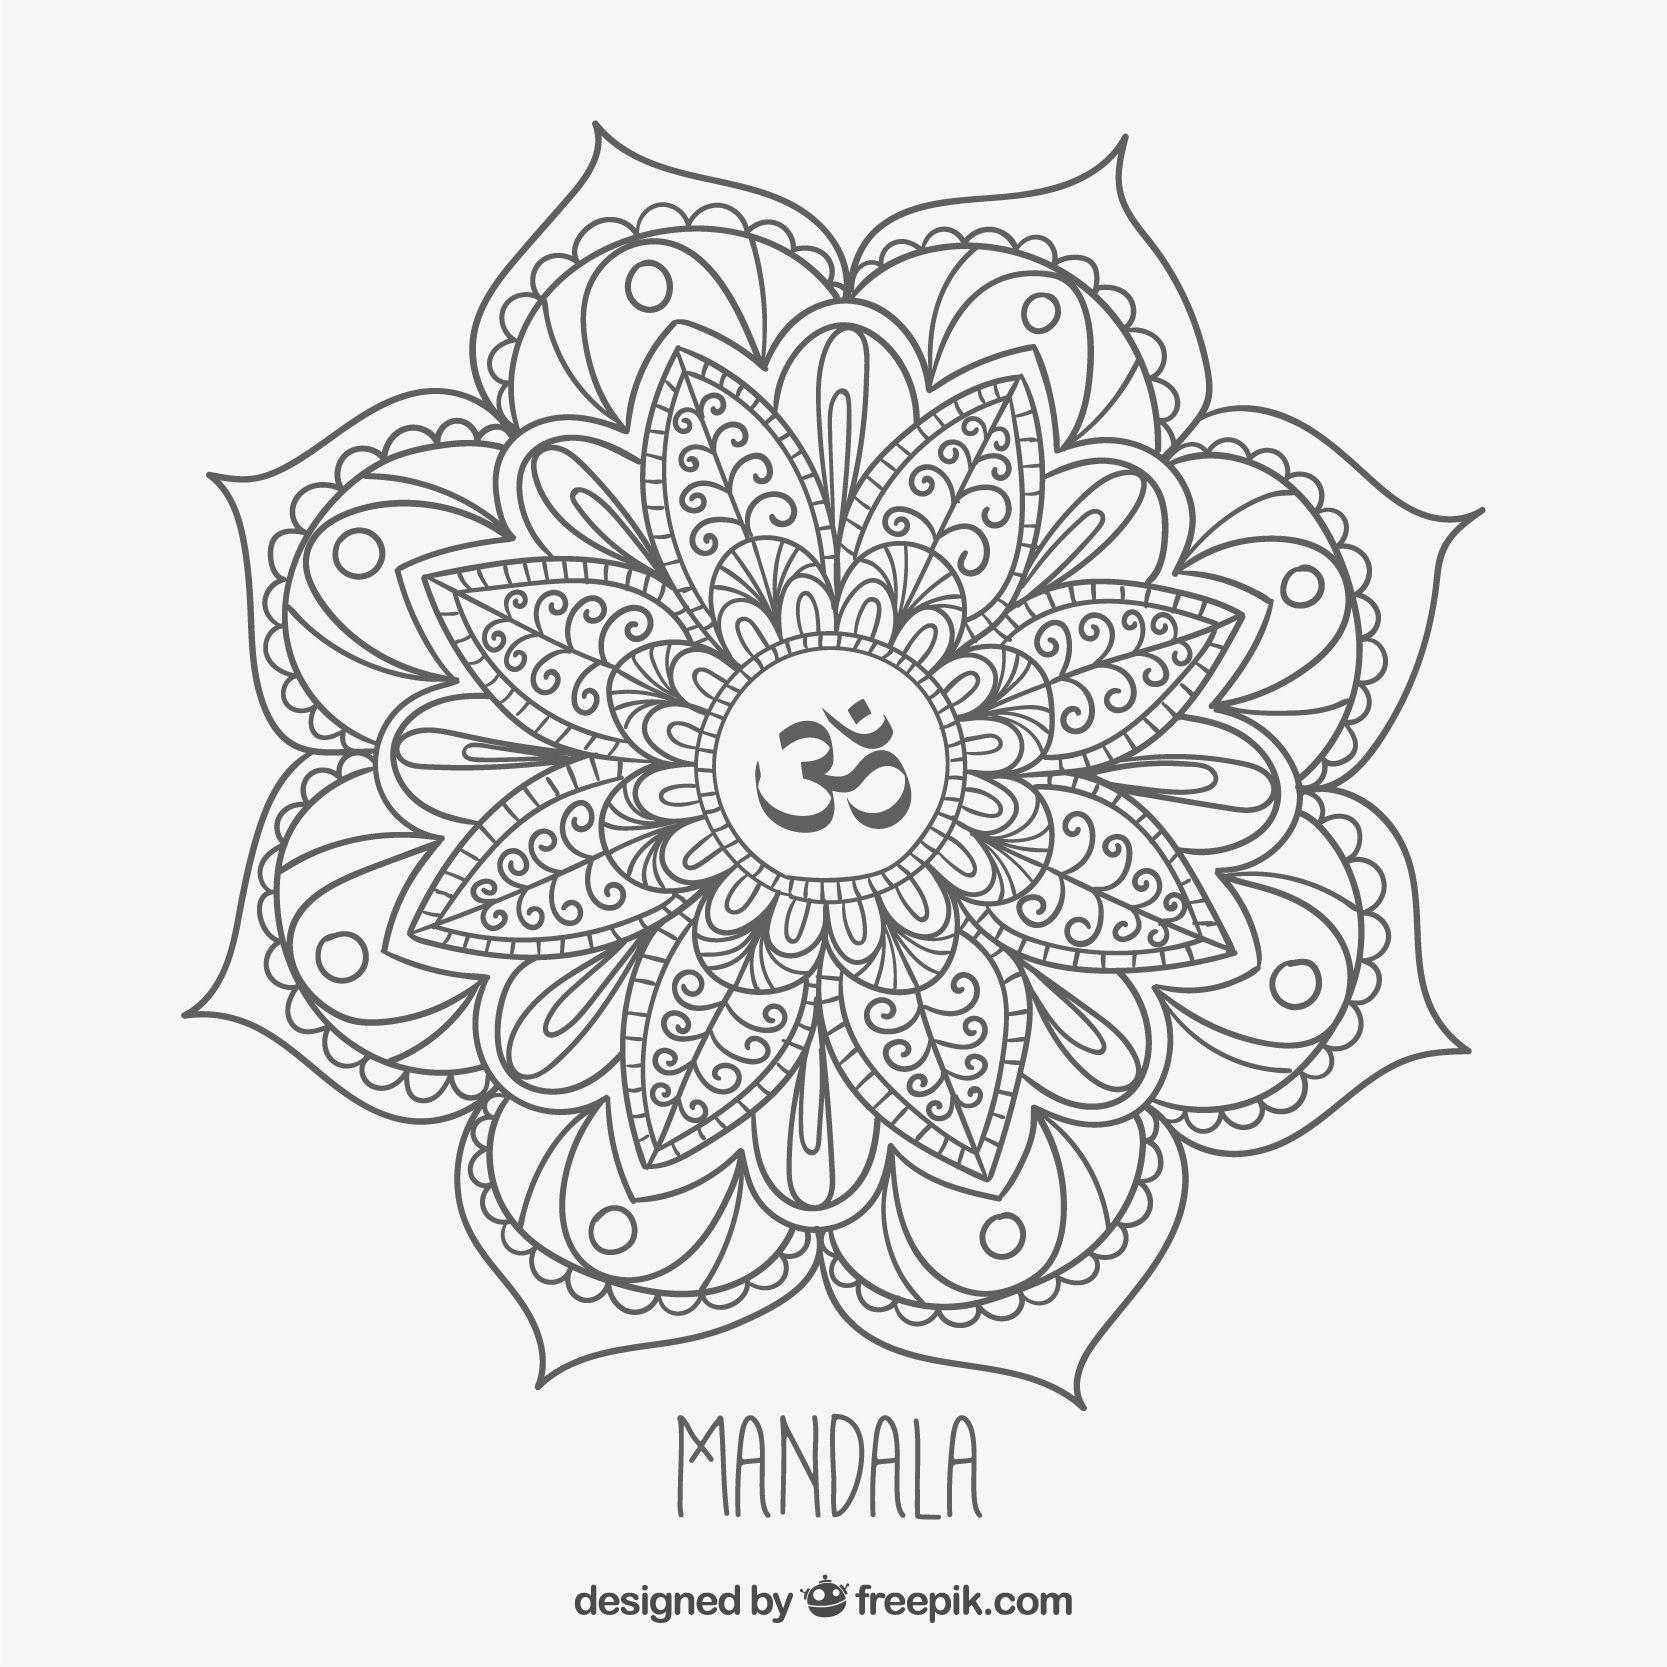 Mandala Monday Free Om Mandala To Color From Freepik Mandala